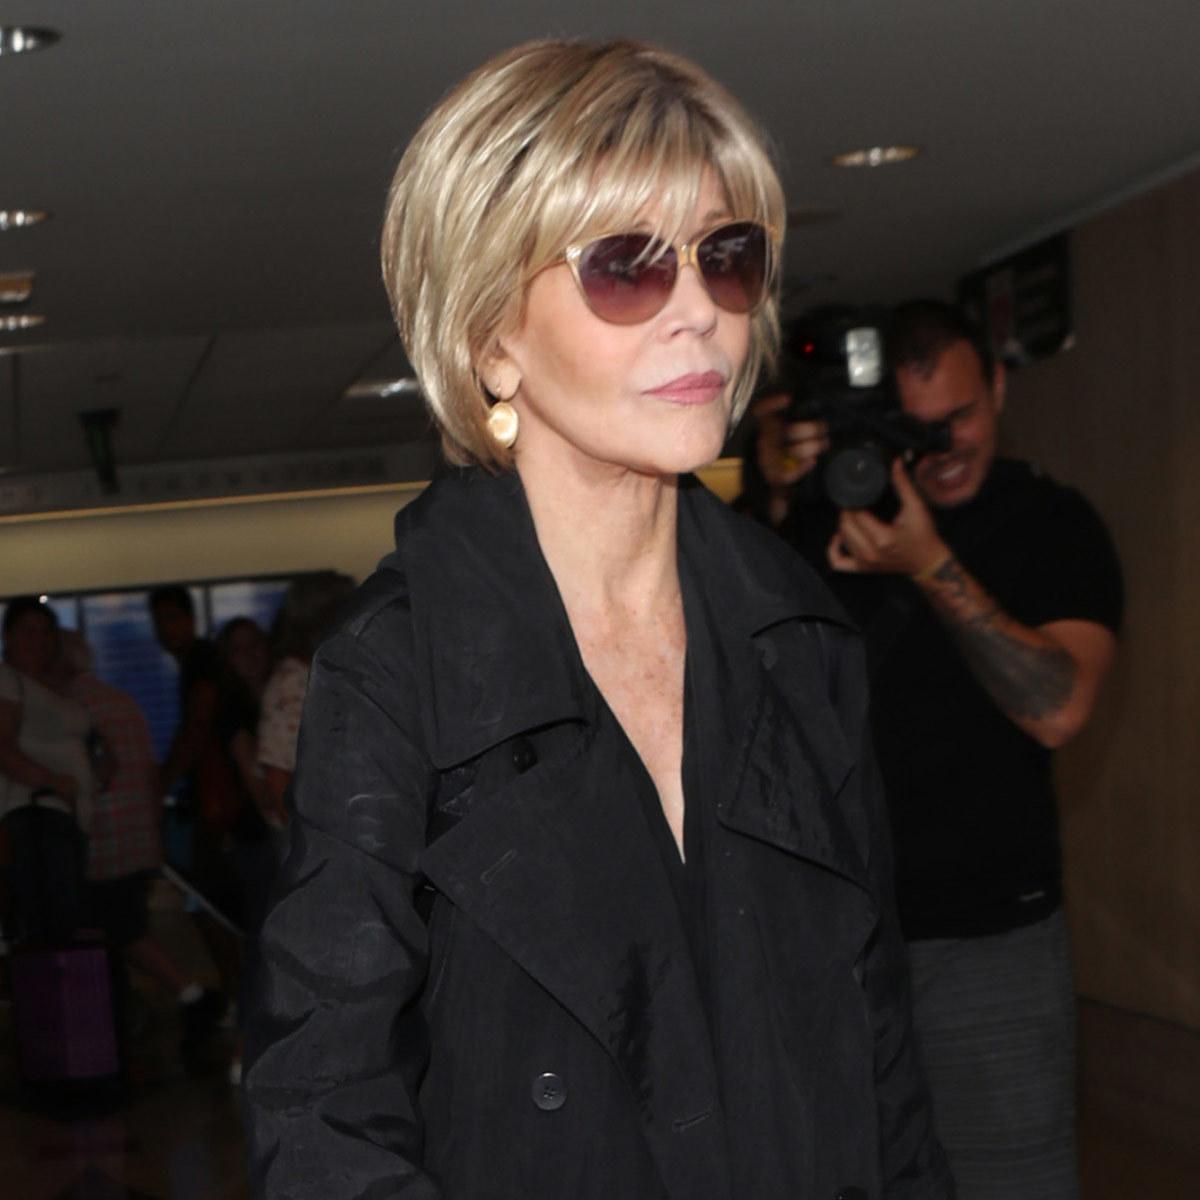 Jane Fonda con un bob muy corto con flequillo y mechas.